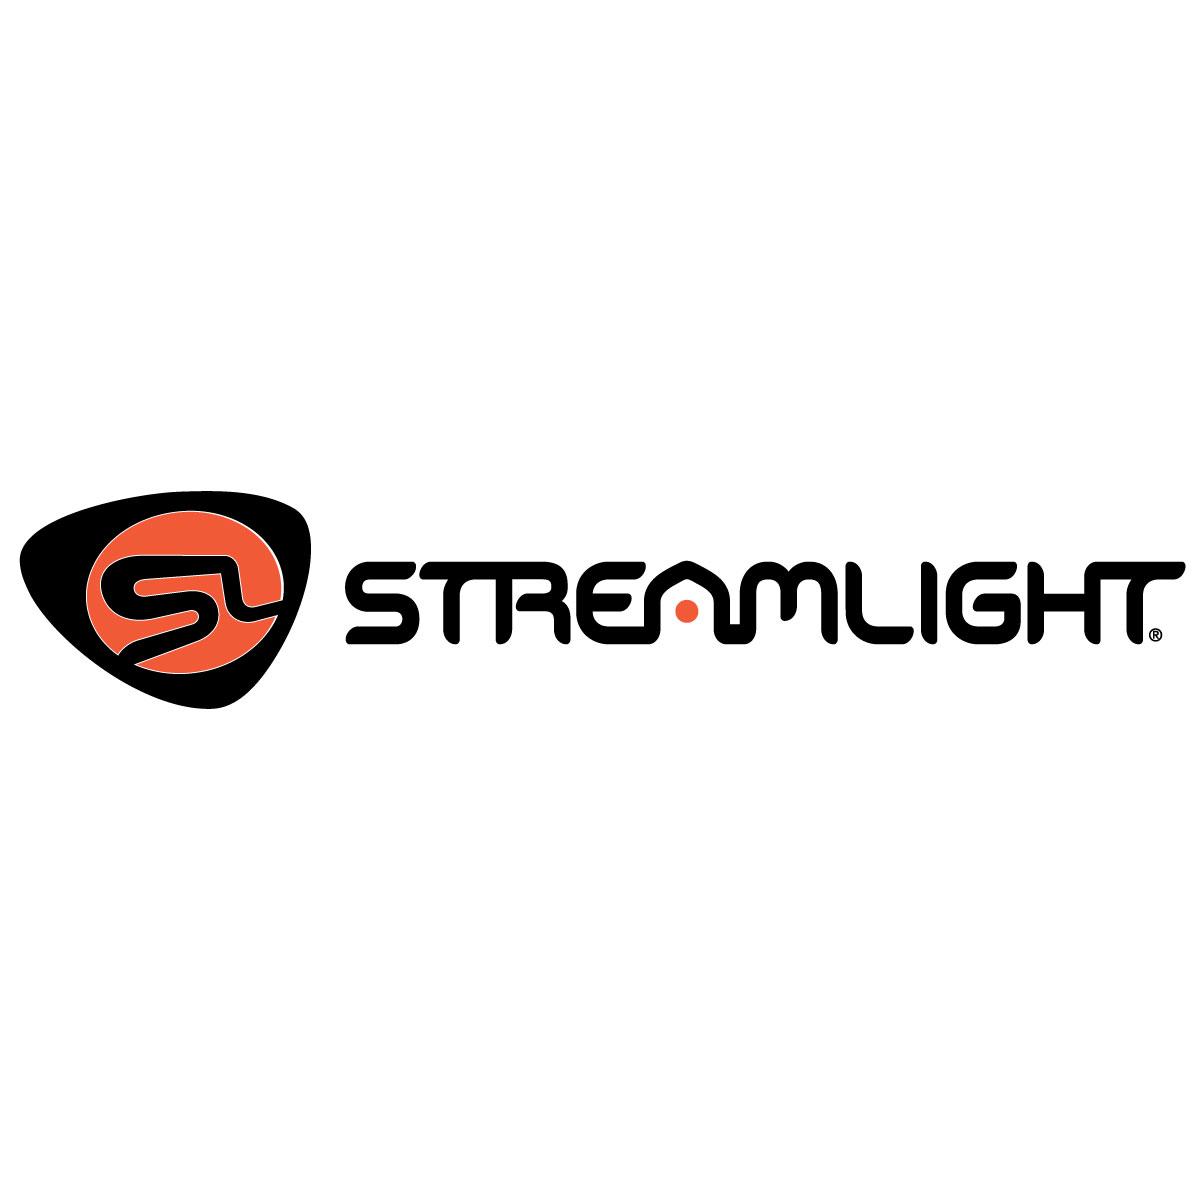 streamlight-logo-1200x1200px.jpg